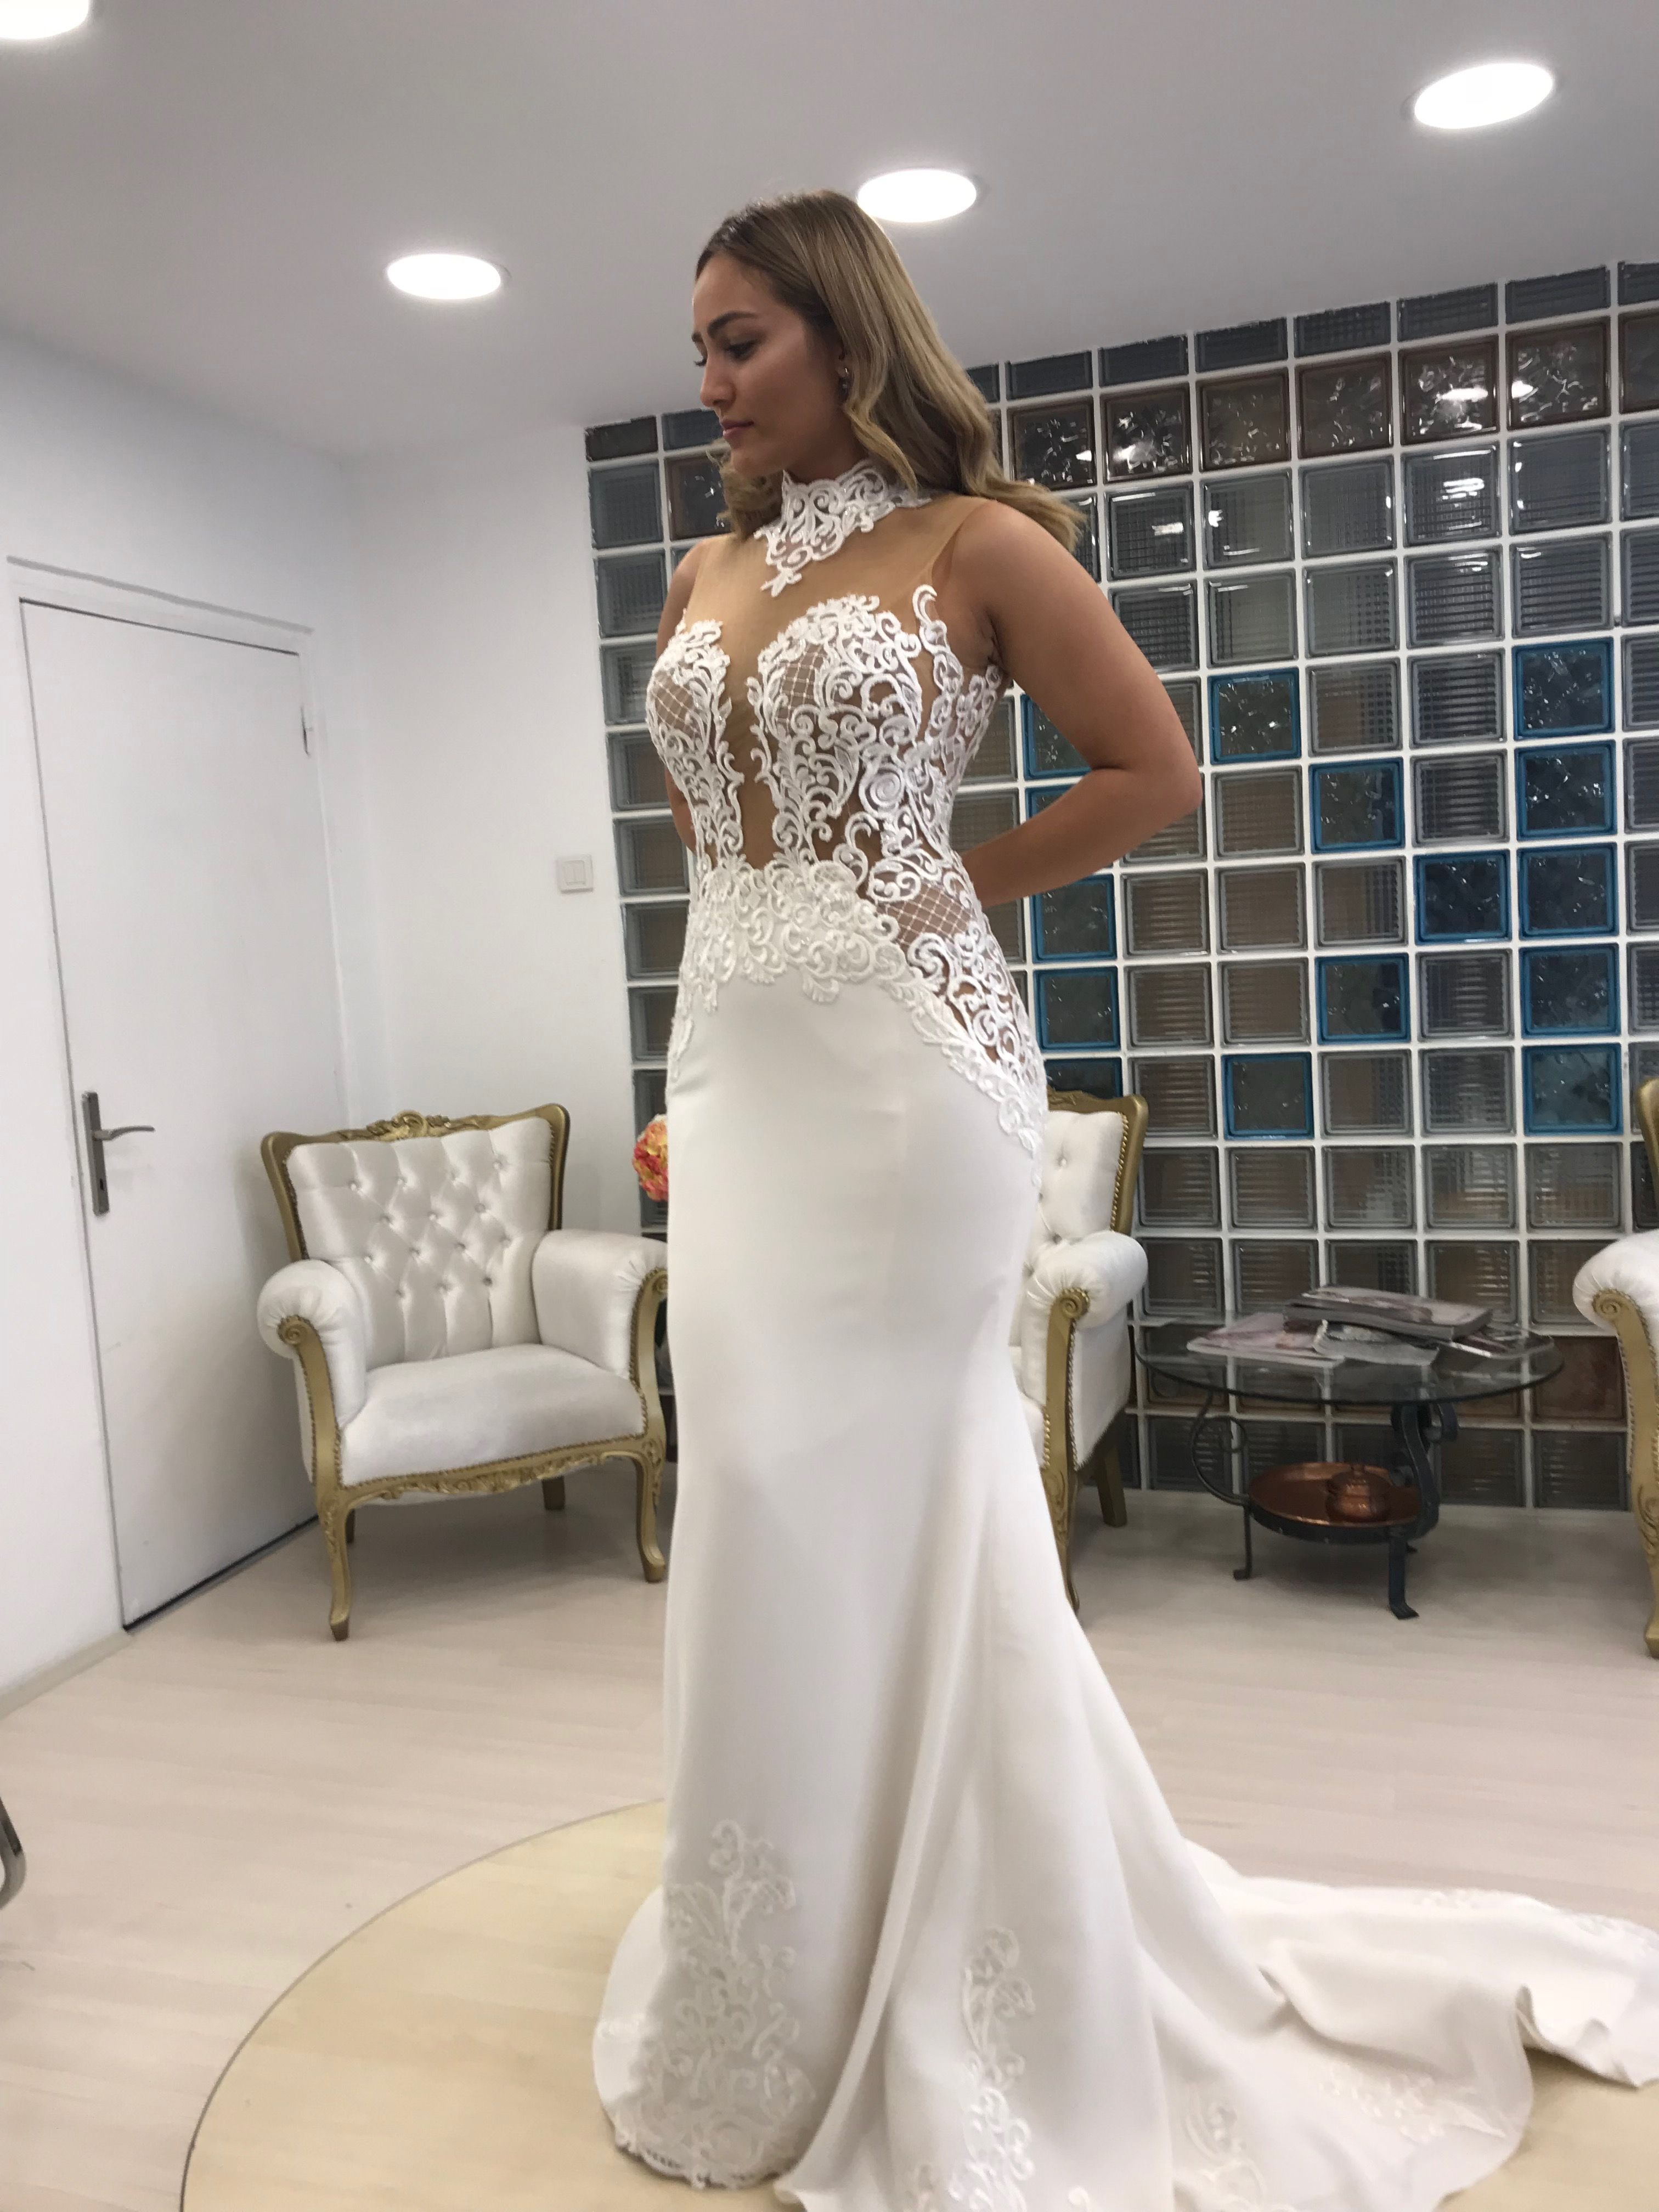 Elite wedding dresses  Pin by HRB Elegant Gelinlik on Elite Bridal Gelinlik Mağazası